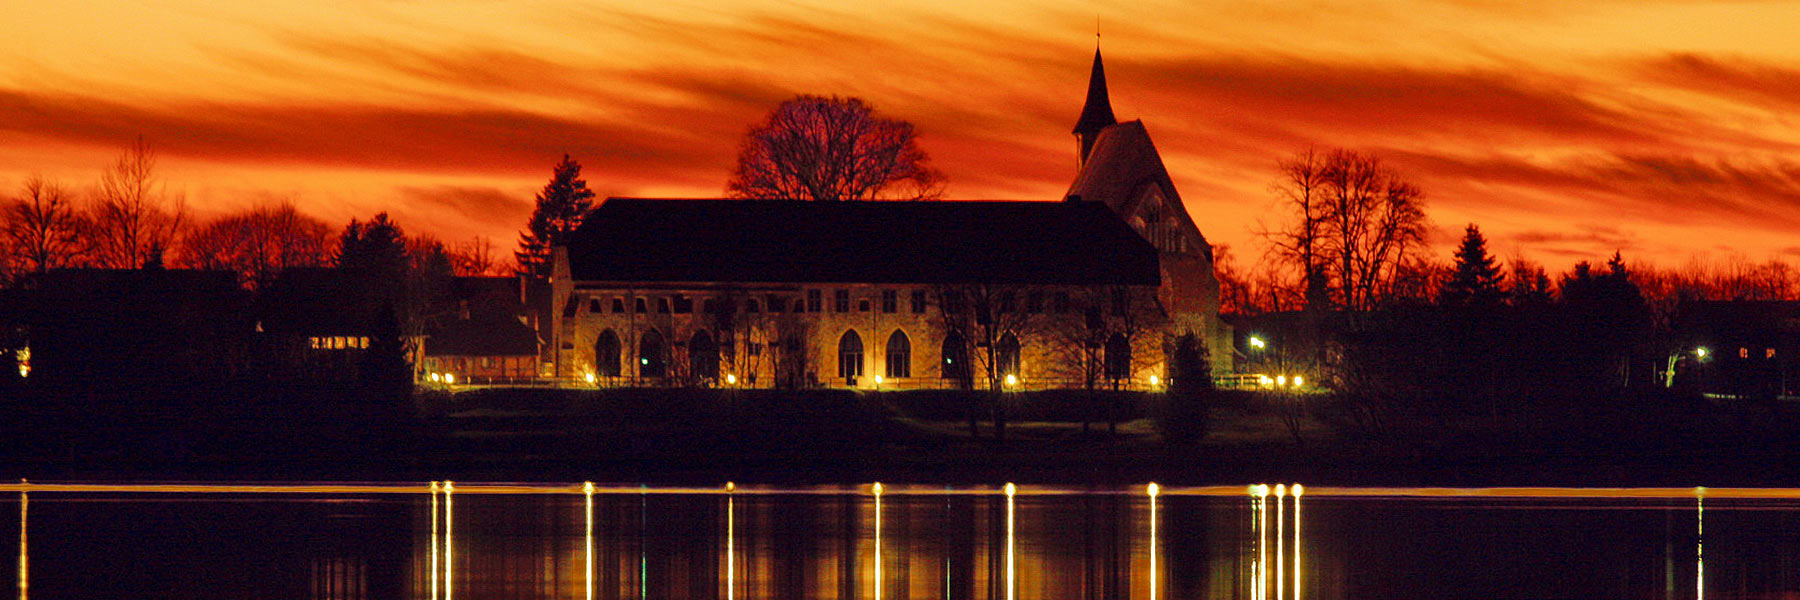 Kirche Sonnenuntergang - Zarrentin